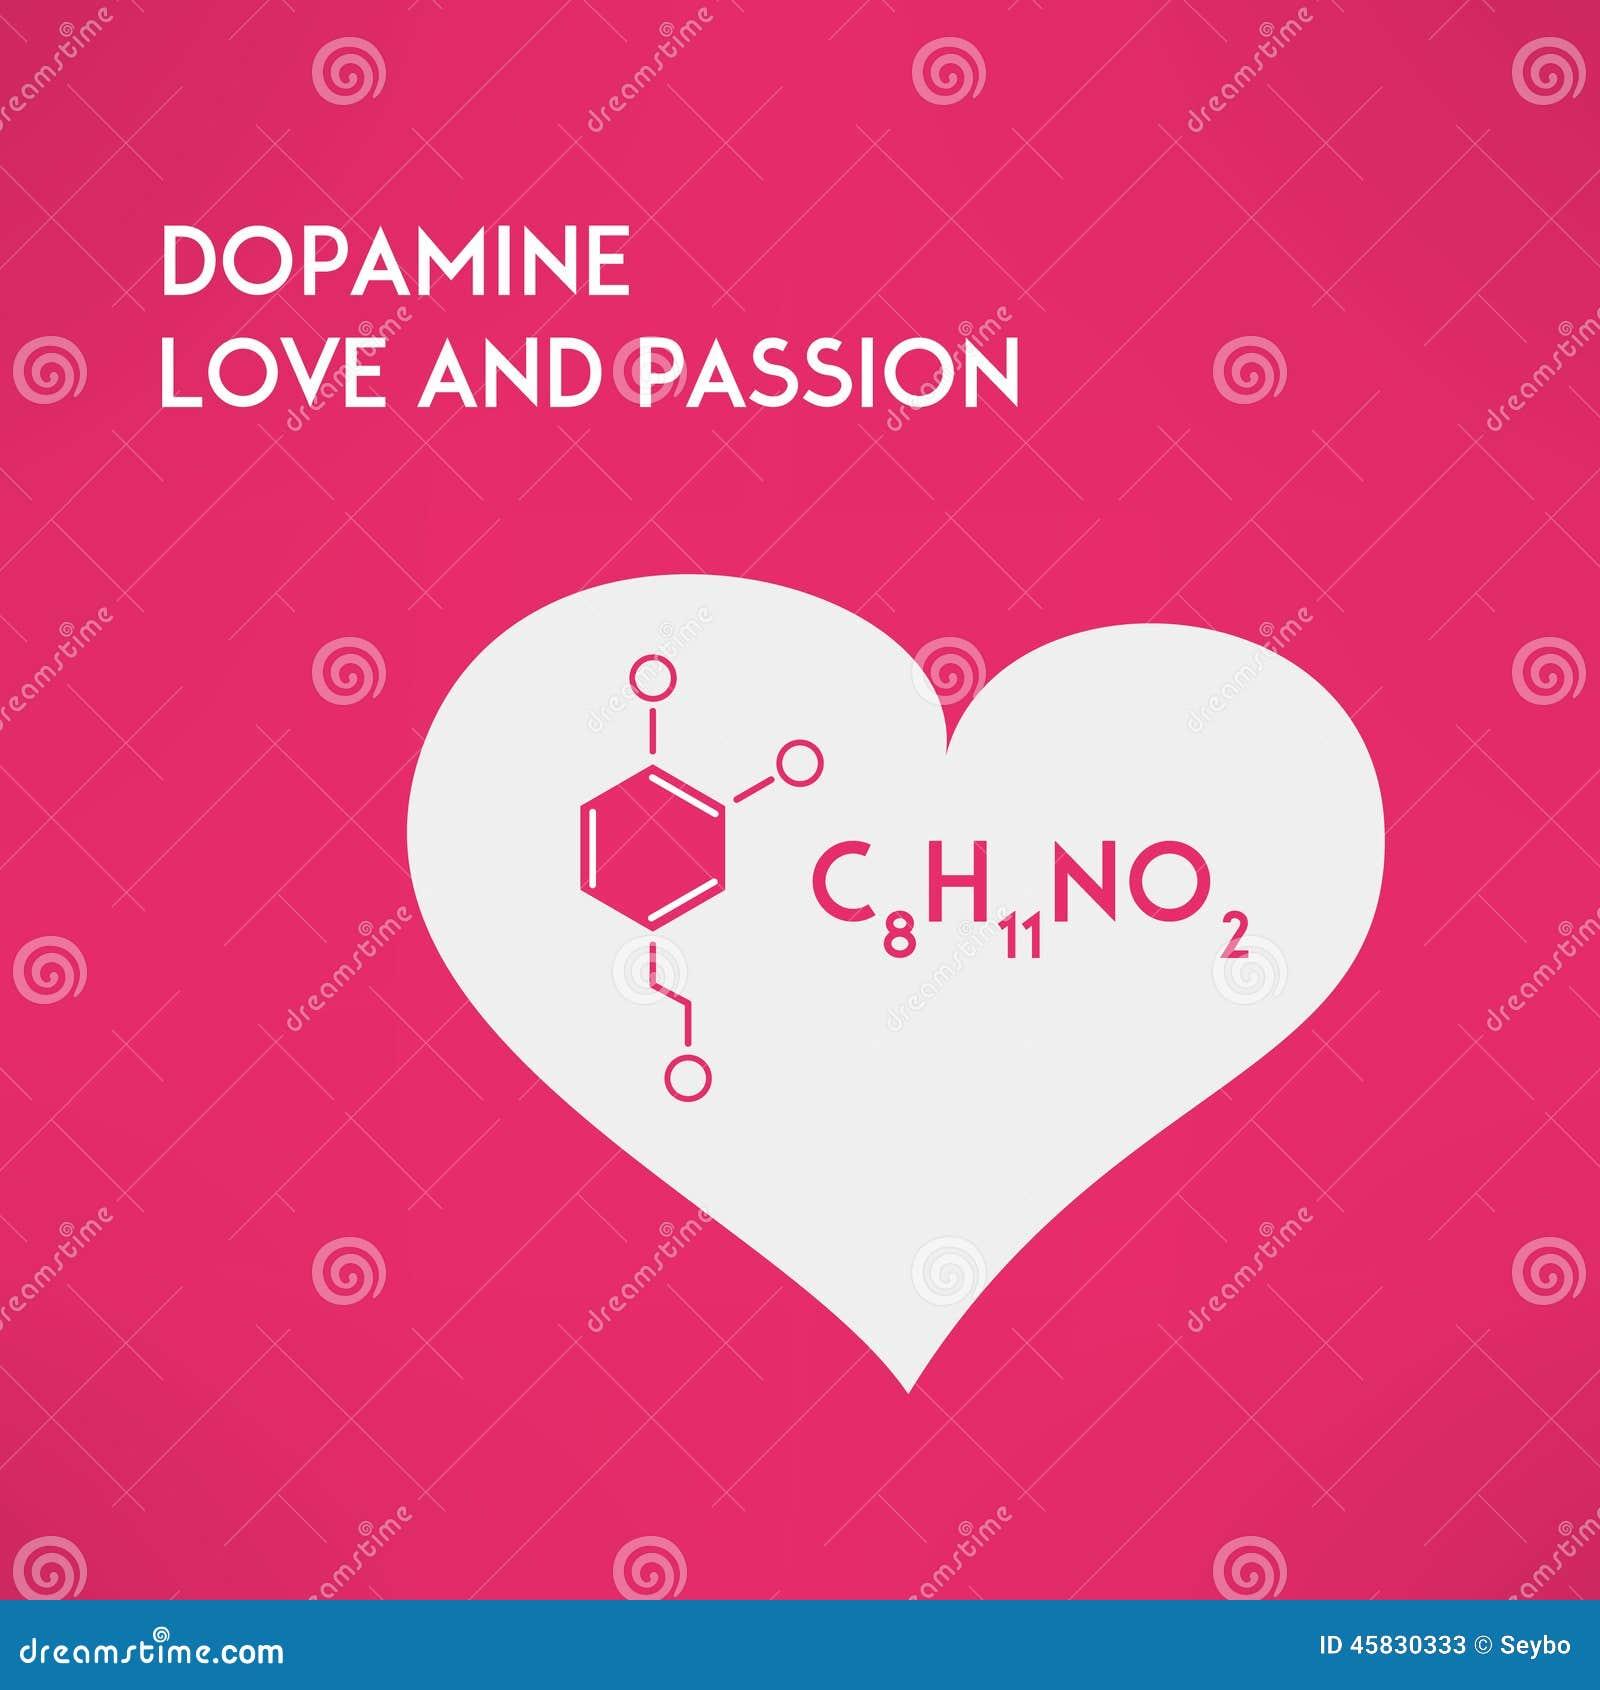 Dopamine Graphic Design